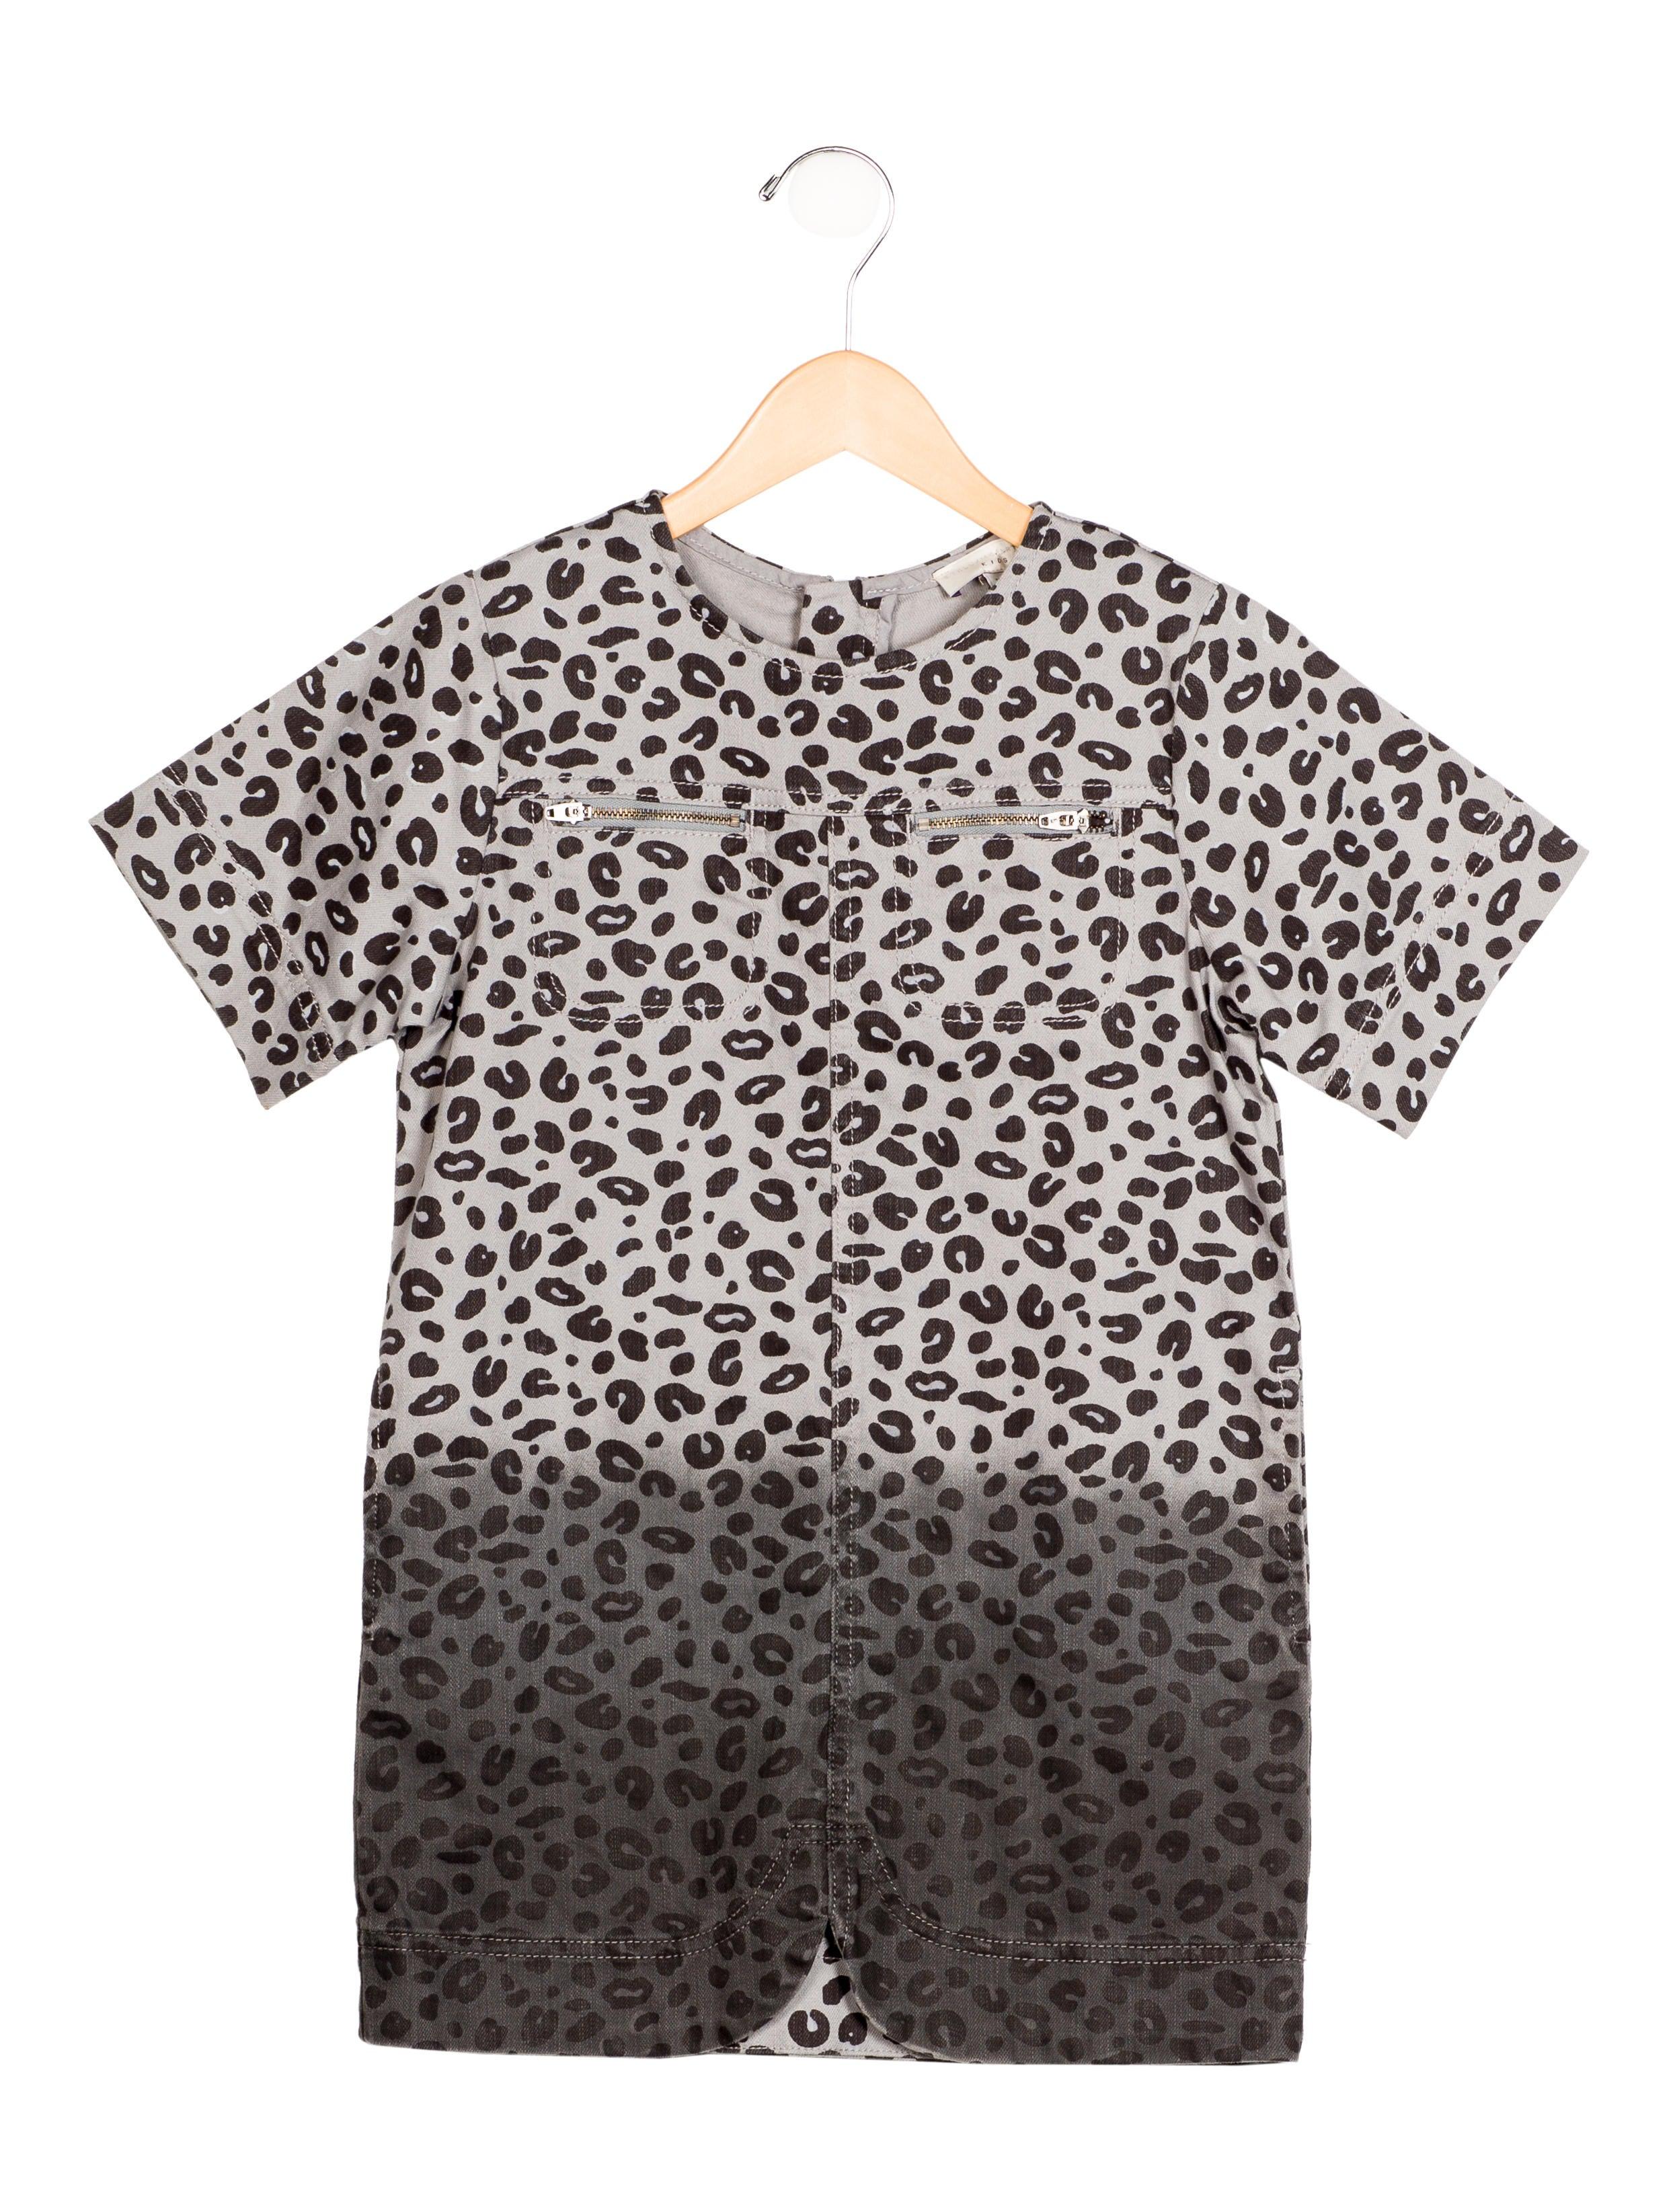 a2d58e6dac0 Stella McCartney Girls  39  Leopard Print Denim Dress w  Tags - Girls -